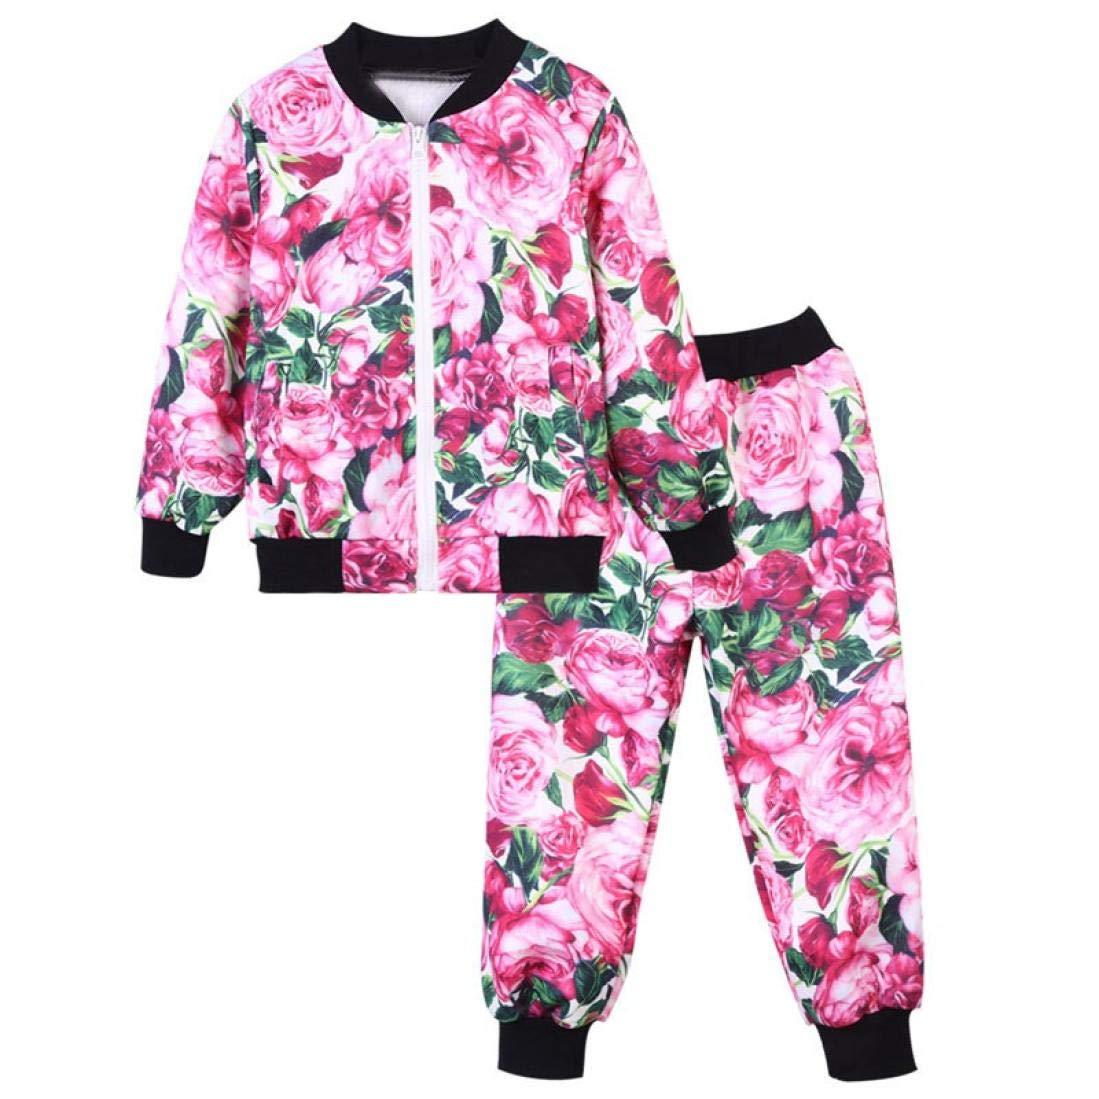 Little Kids Autumn Sweatshirt Sets,Jchen(TM) Toddler Child Floral Sport Tracksuit Outfits Little Boys Girls Long Sleeve Zipper Tops Coat Pants Set for 1-8 Y (Age: 6-7 T, Pink)